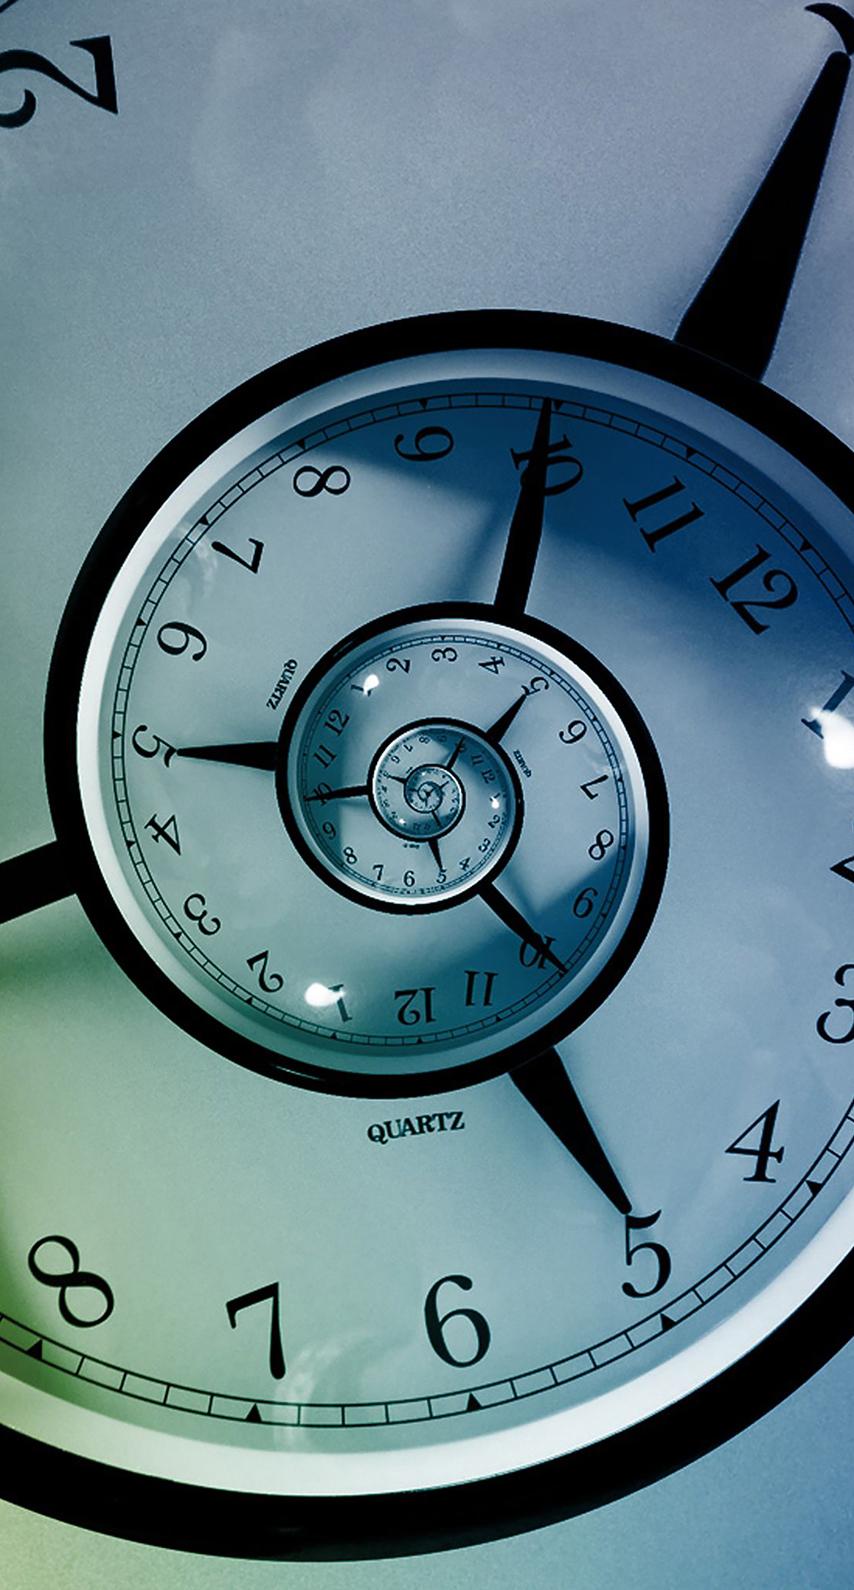 watch, minute